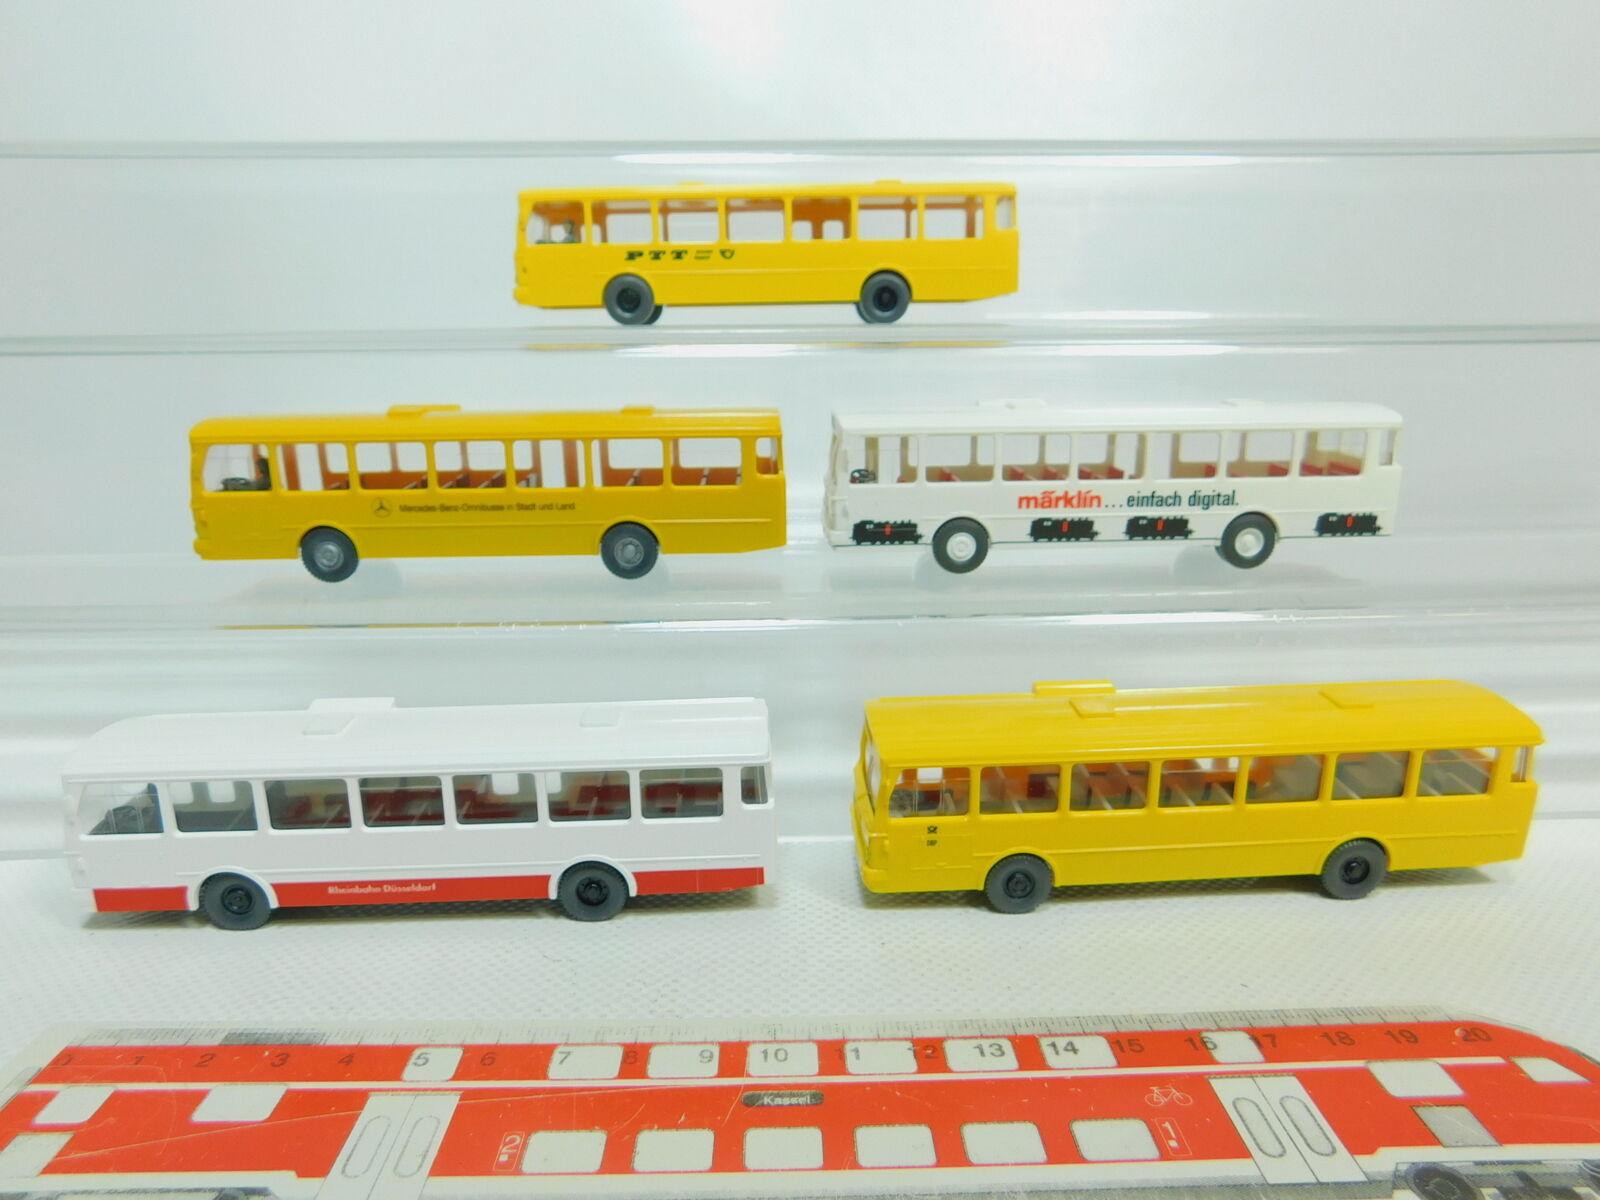 Bo796-0,5   5x wiking h0   87 700 autobus mb o 305 m ä rklin + + dbp telekom ecc.,